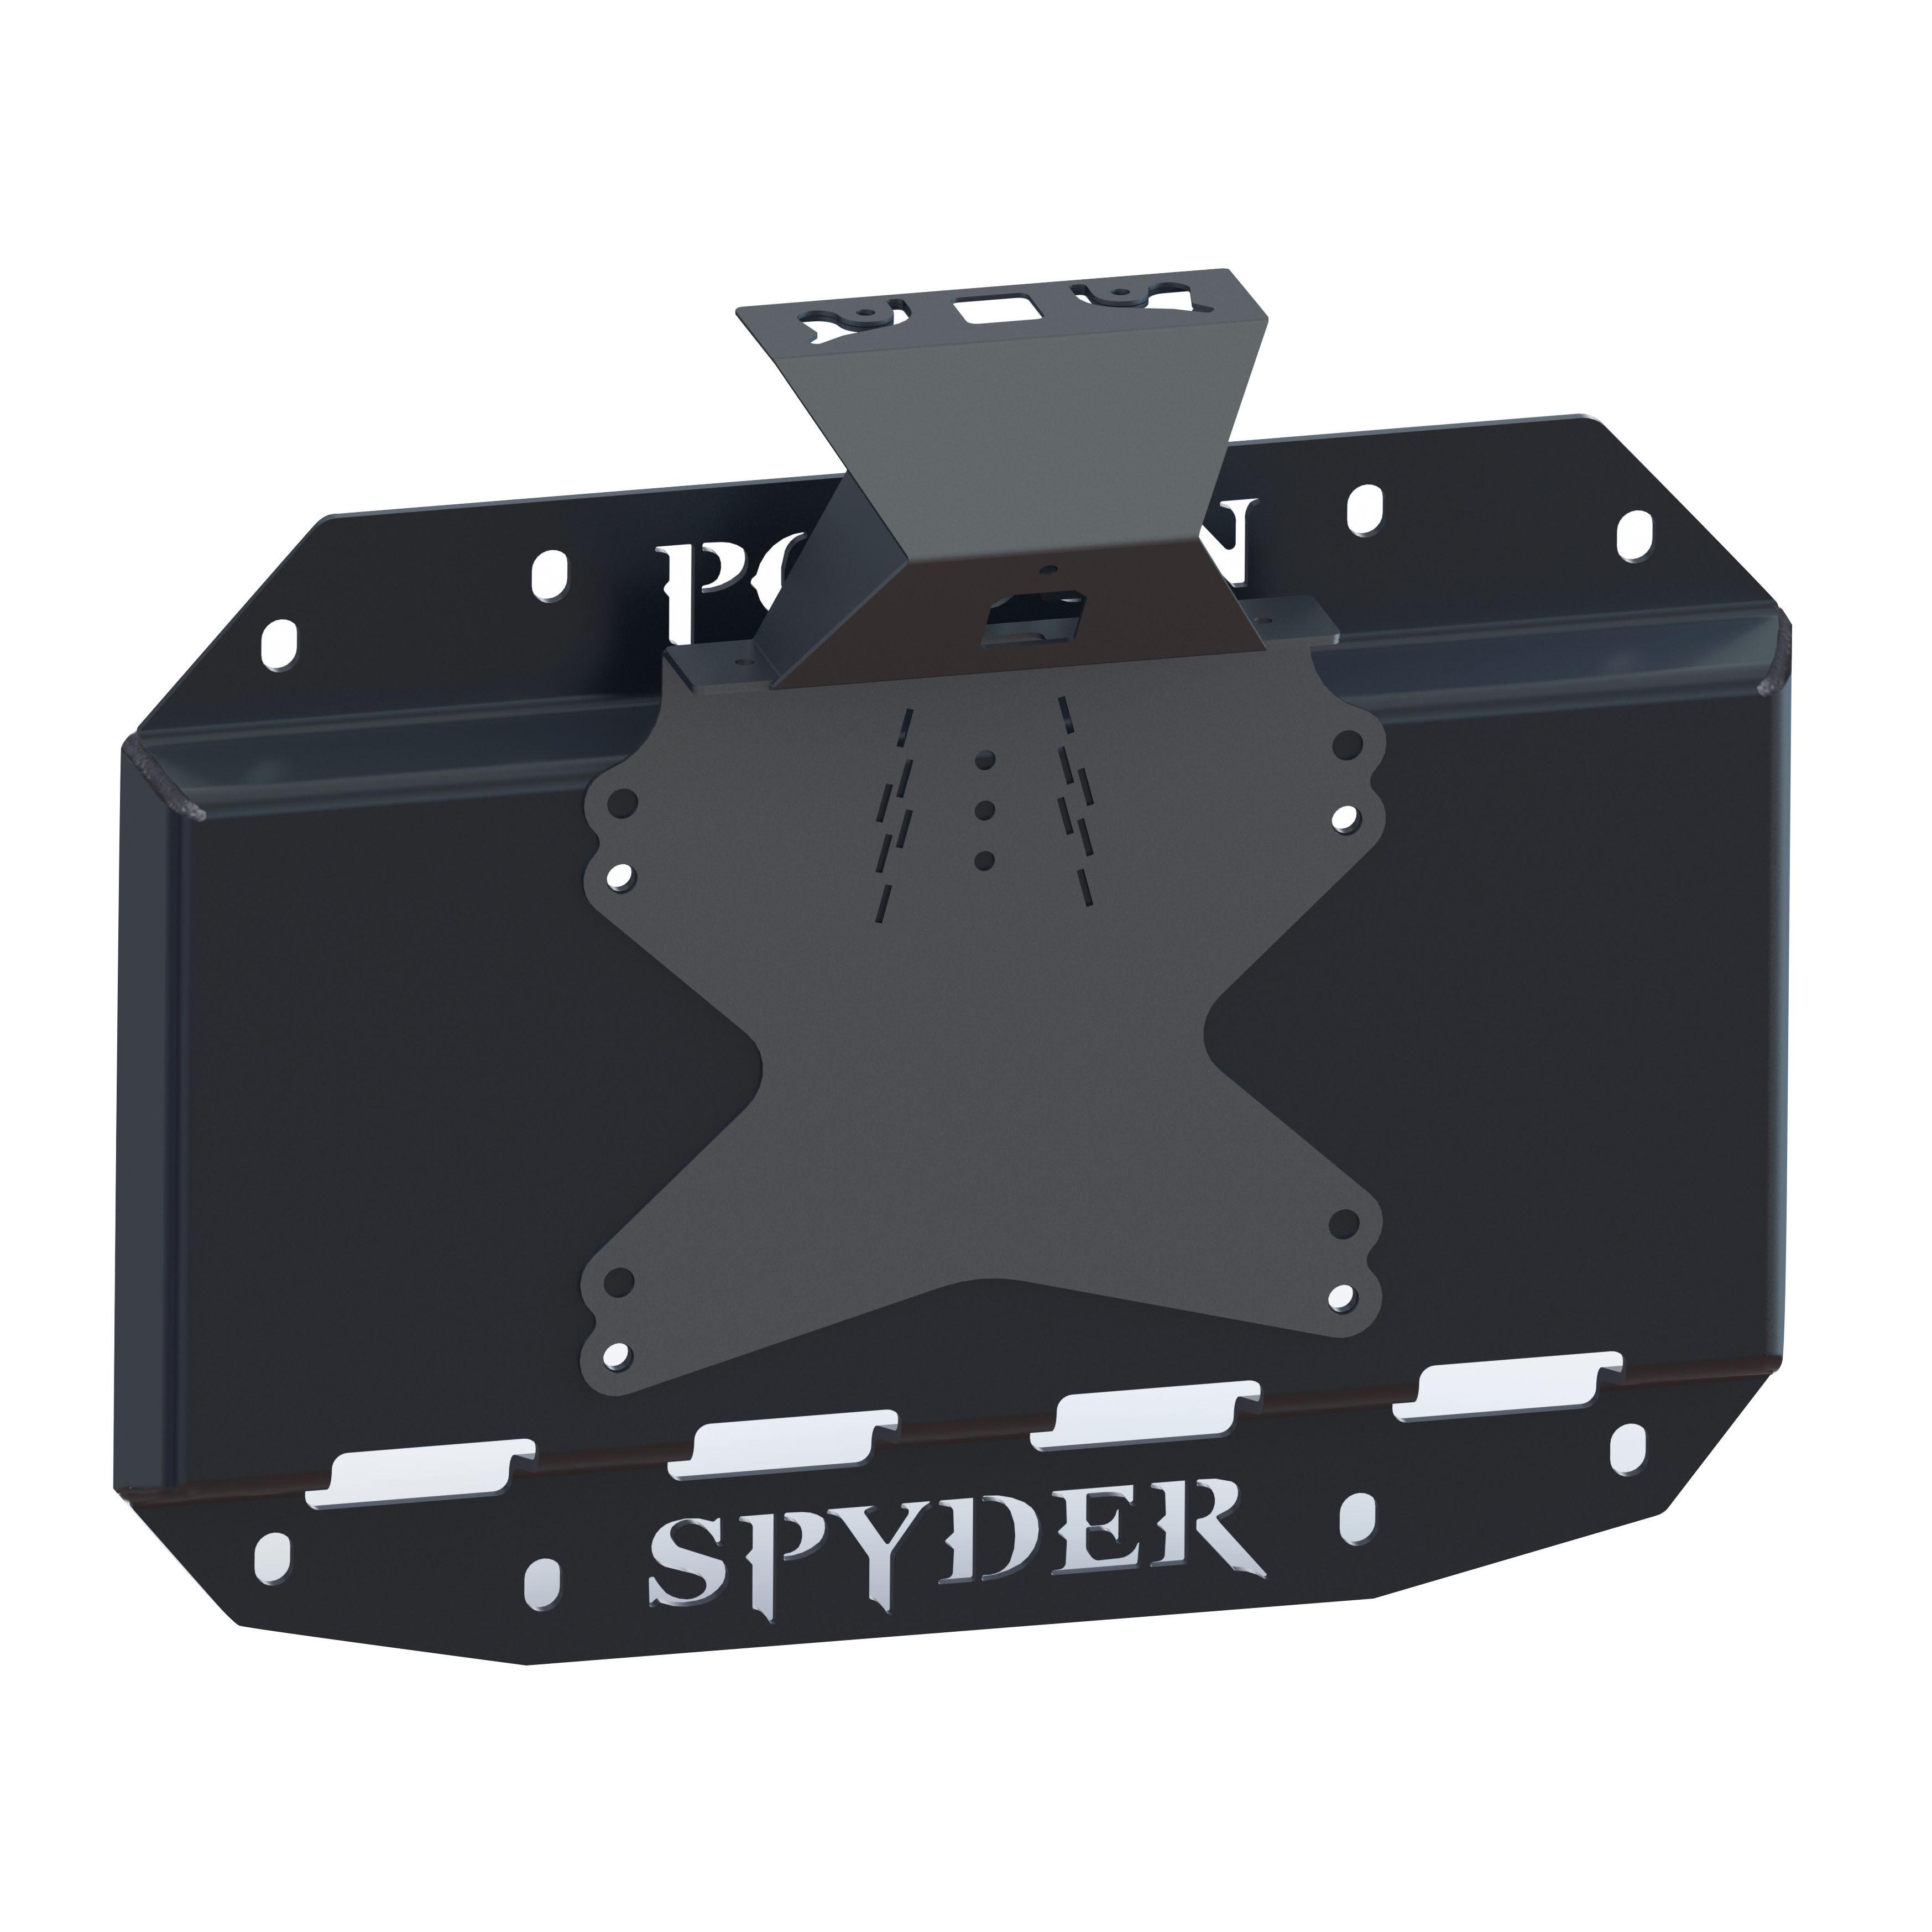 Poison Spyder Tire Carrier Delete Plate With Camera Mount - For 2018+ Jeep Wrangler JL 2 Door & Unlimited 4 Door Models 19-04-013P1